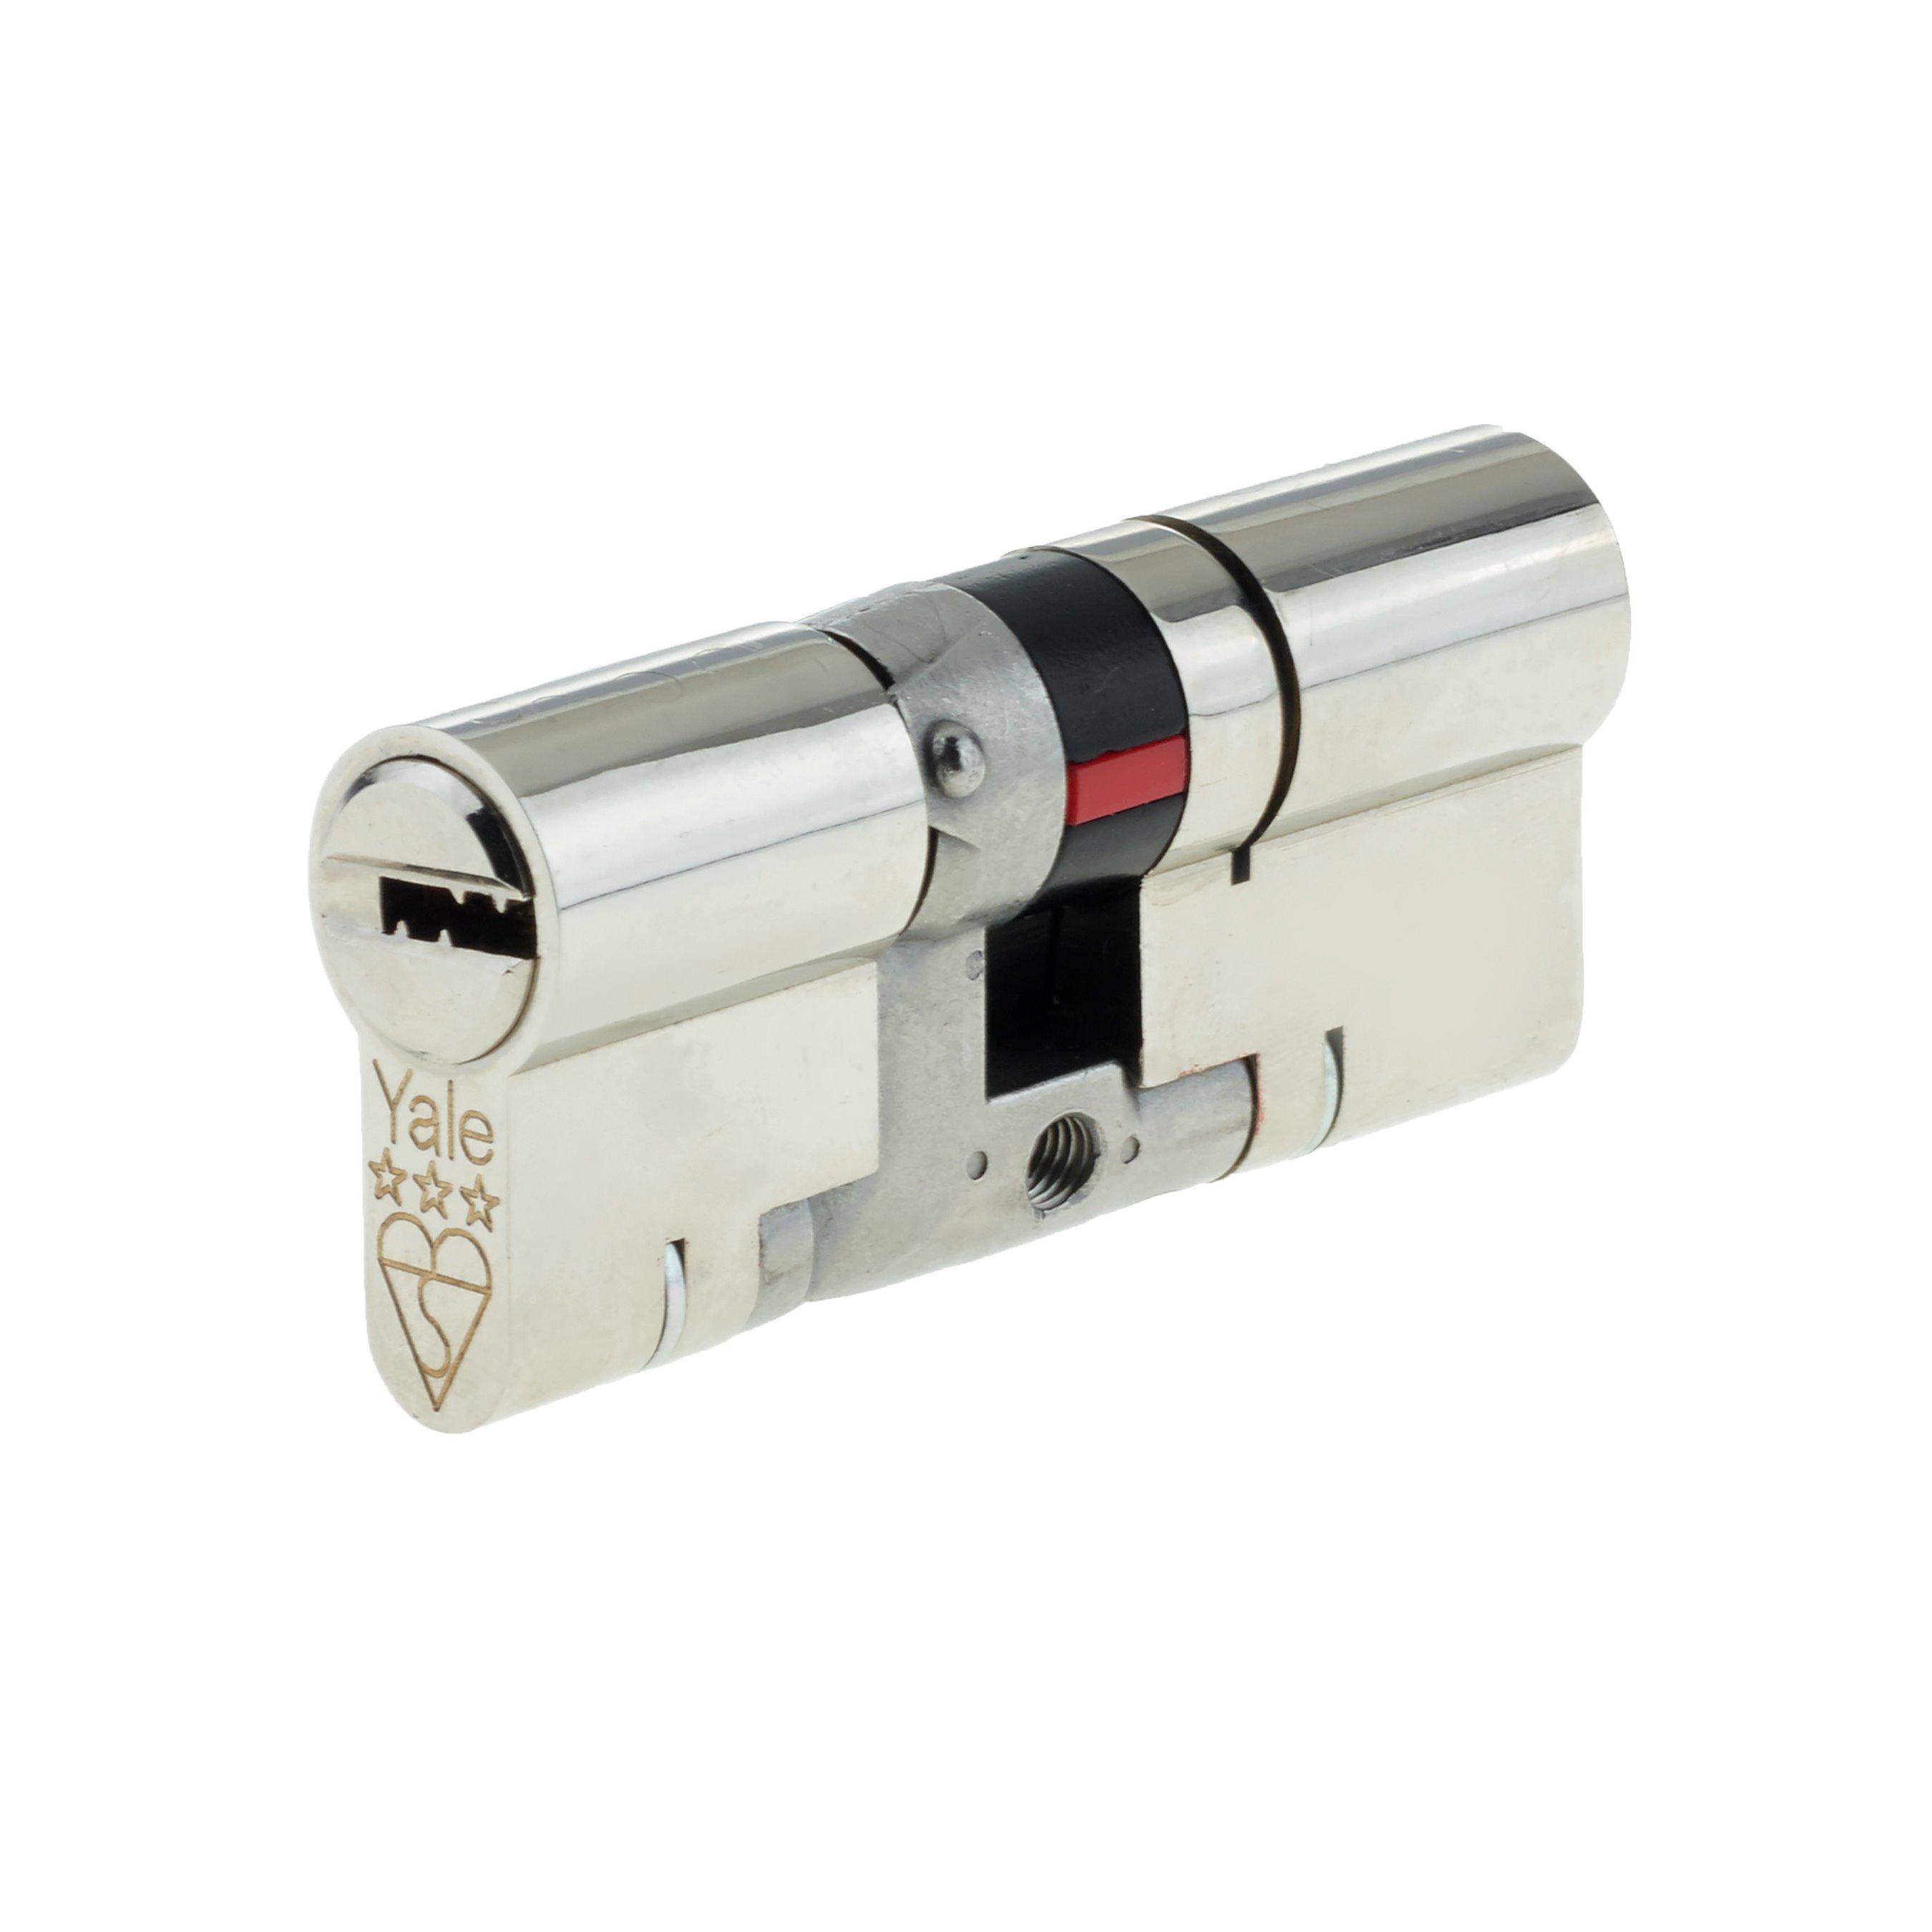 Platinum 3 Star Euro Profile Cylinder